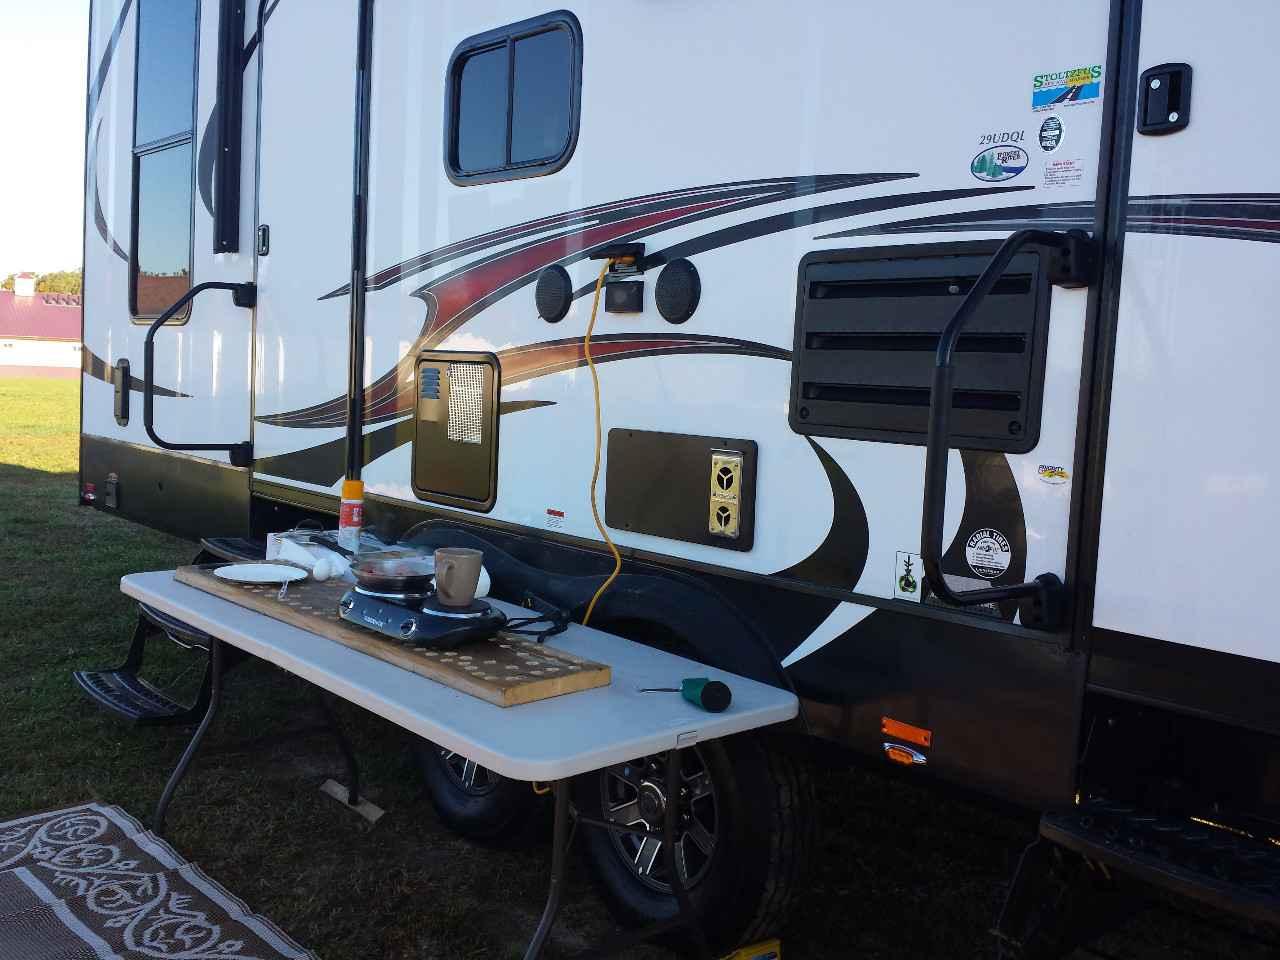 2015 Used Forest River Nitro Xlr 29udql5 Toy Hauler In